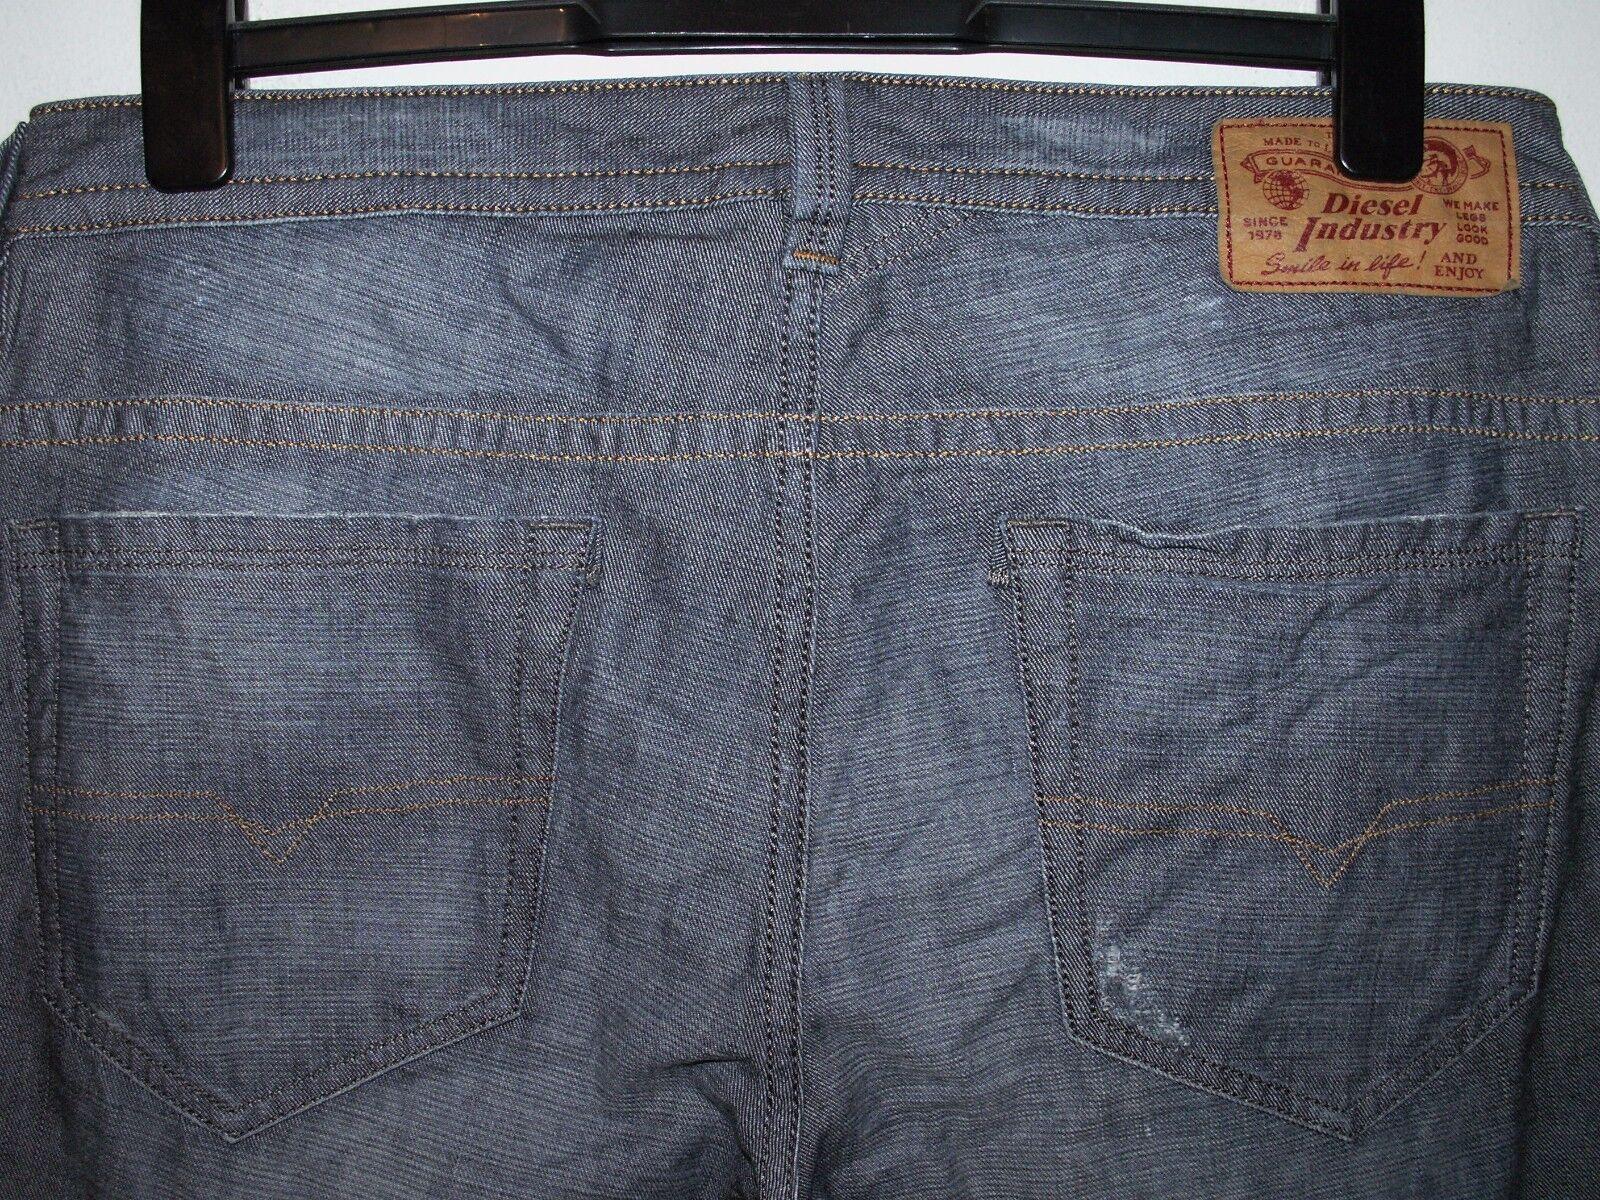 Diesel thavar slim-skinny fit jeans wash 0R7R8 W33 L32 (a2870)